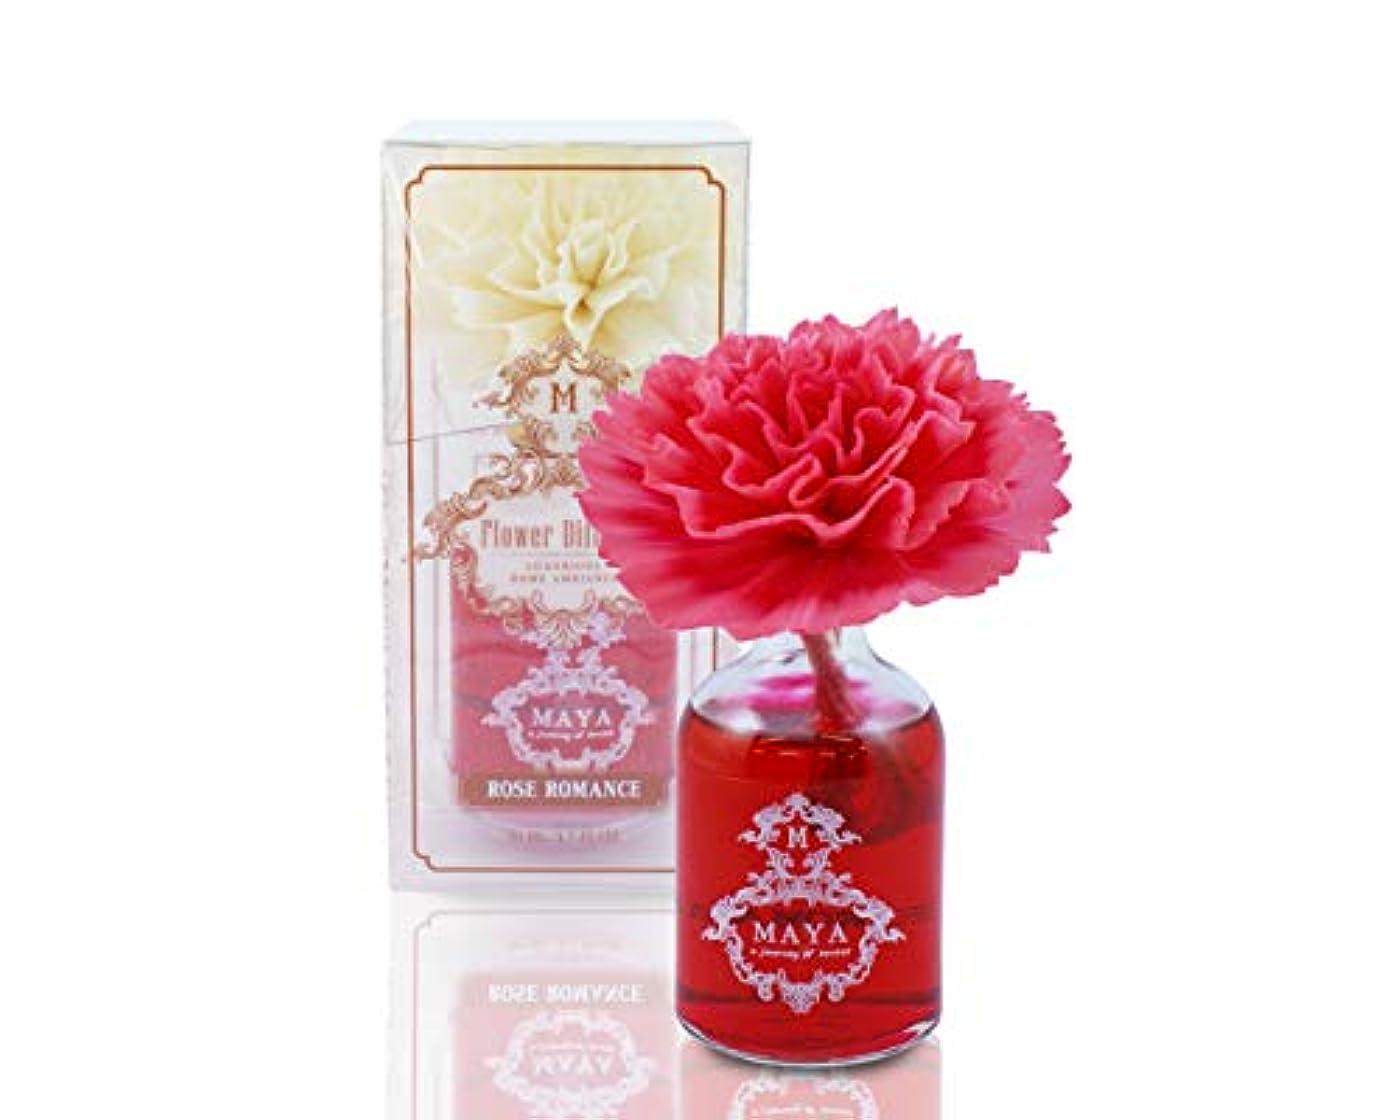 MAYA フラワーディフューザー ローズロマンス 5oml | 日本限定商品 |Aroma Flower Diffuser - Rose Romance 50ml